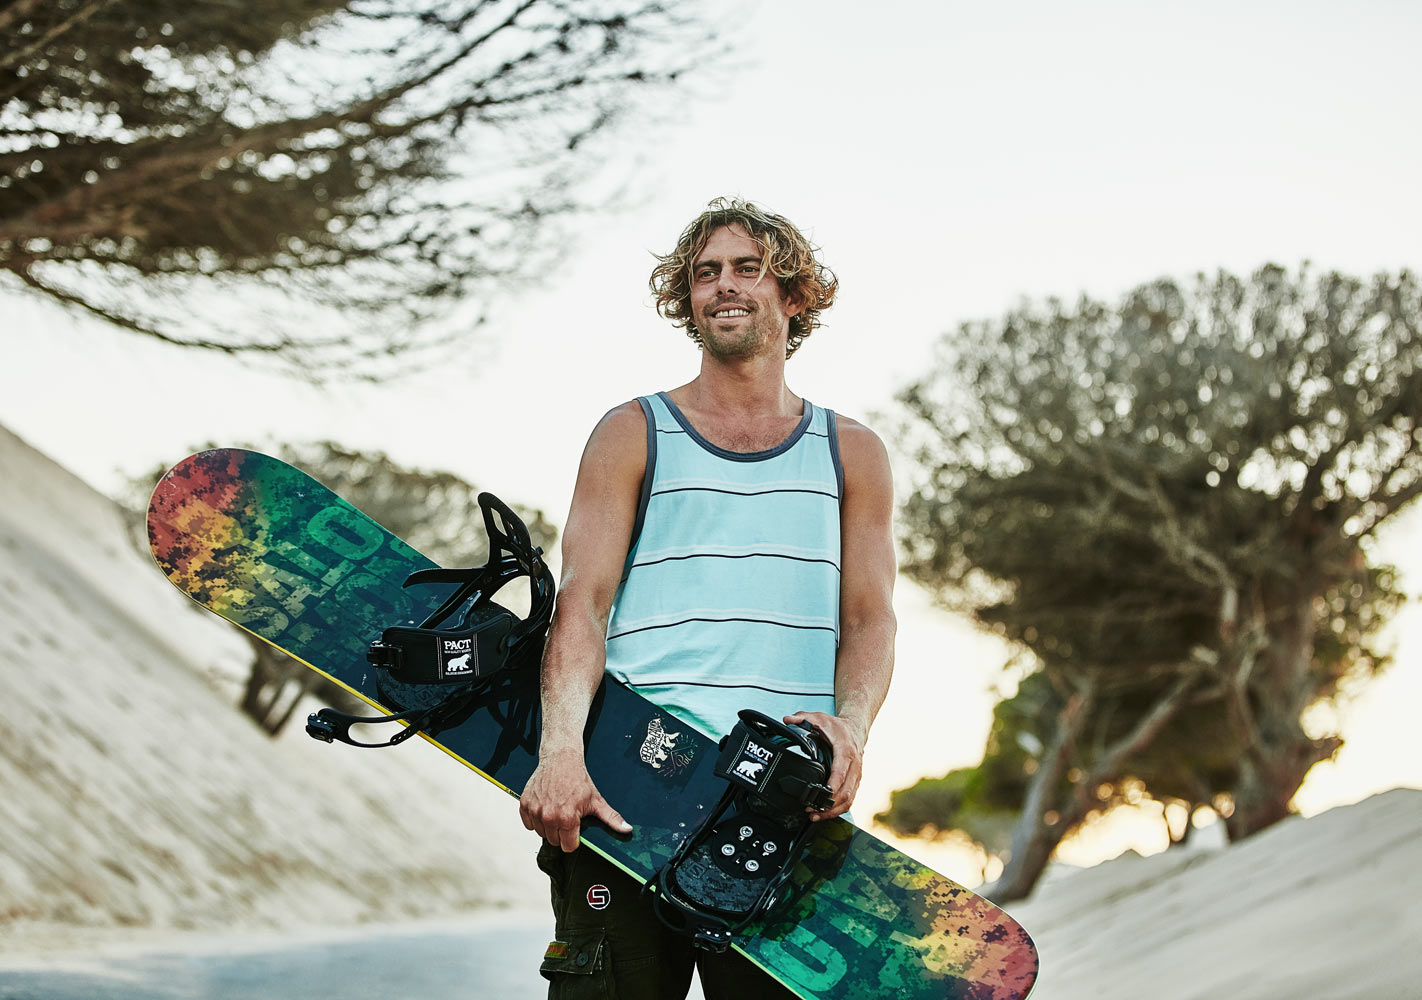 pavel-hejny-sandboarder-lifestyle-3